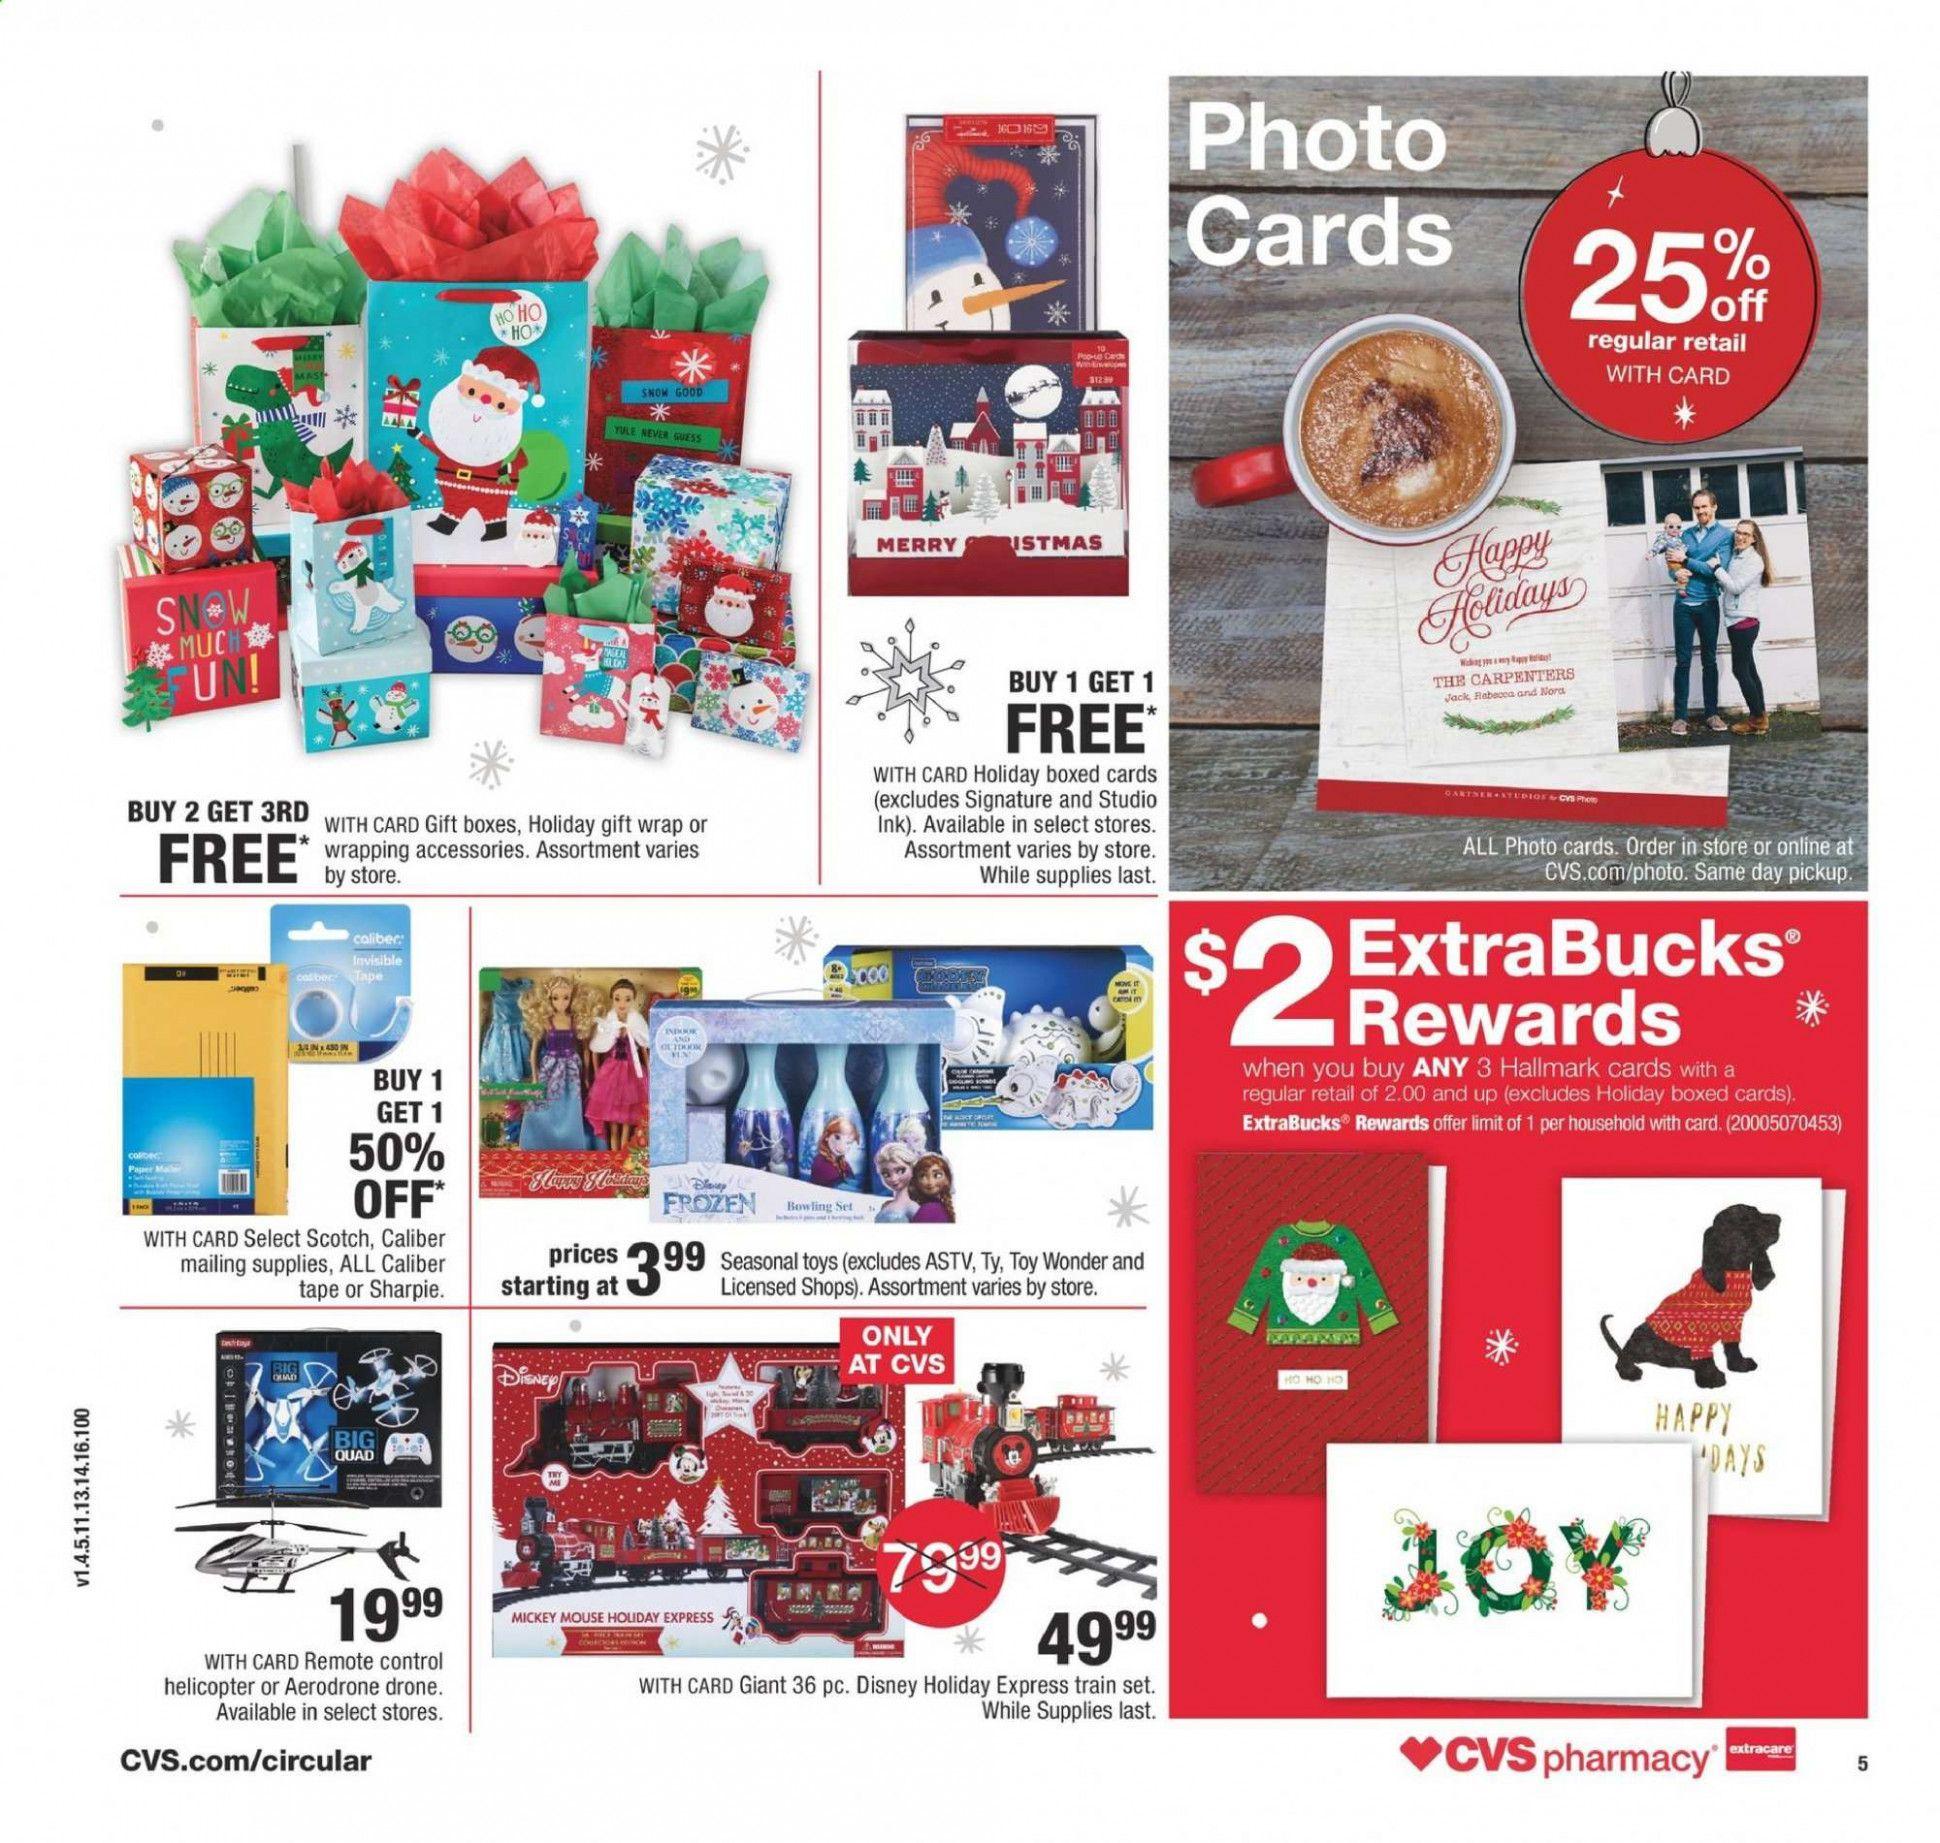 Cvs Christmas Cards 2020 6 Cvs Boxed Christmas Cards in 2020 | Boxed christmas cards, Boxed